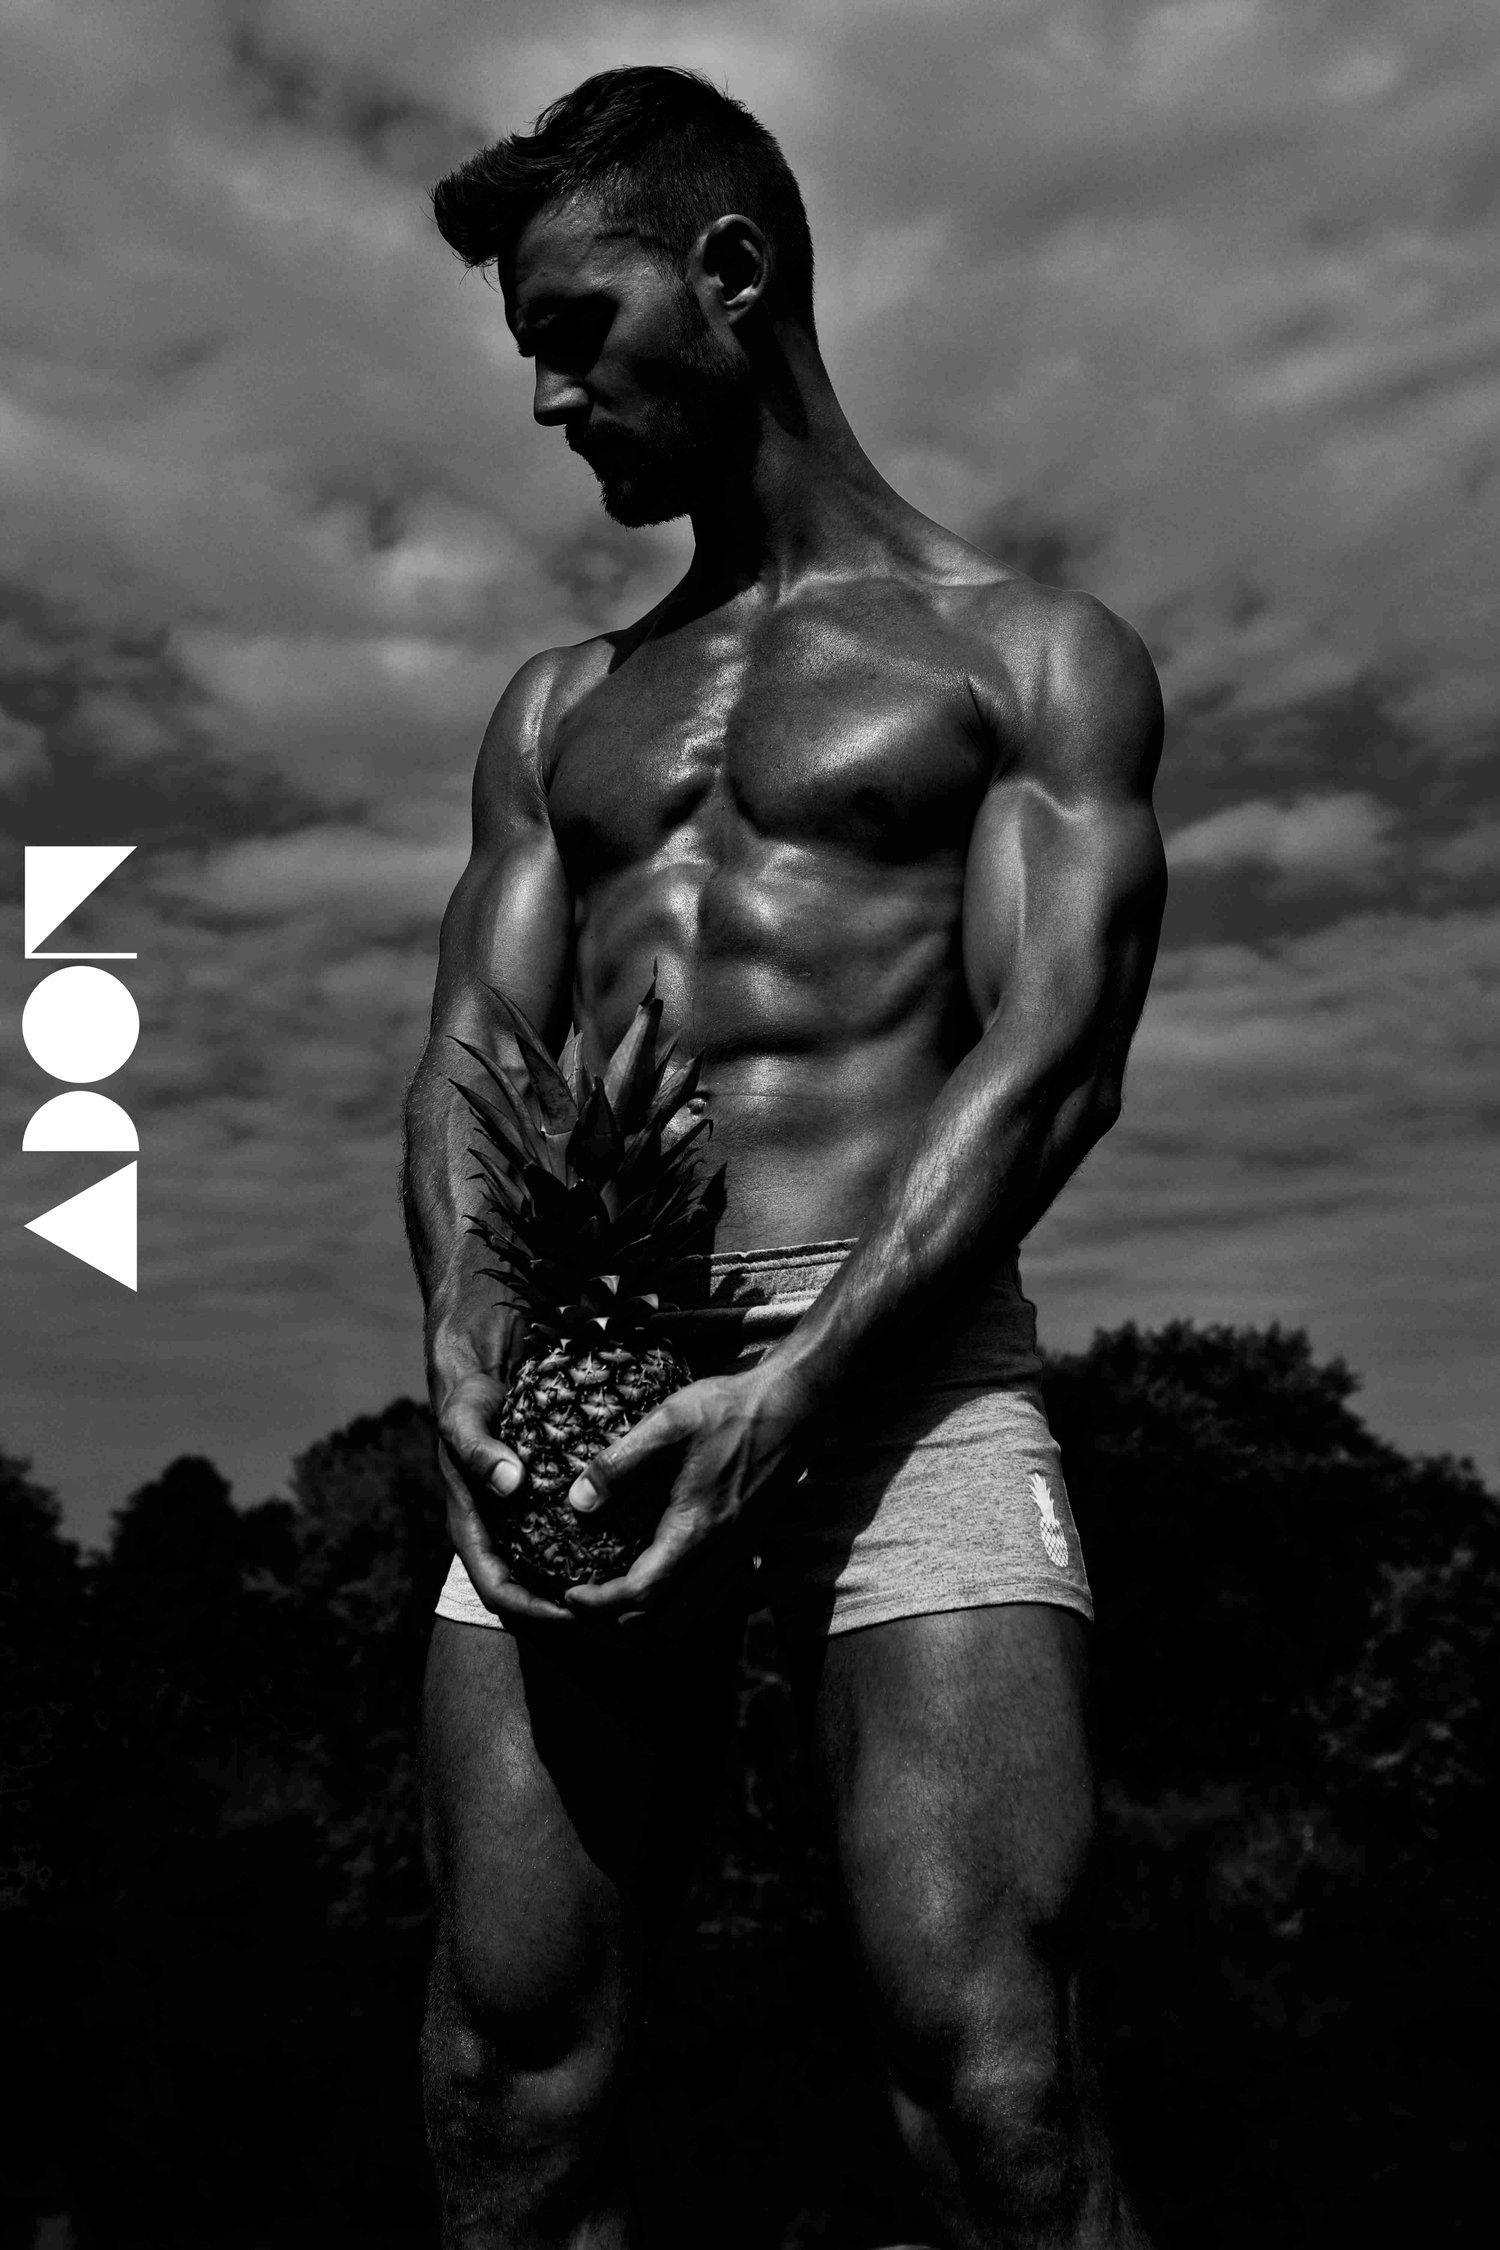 Adon Exclusive: Model Steve Hodgson By Paul Jamnicky